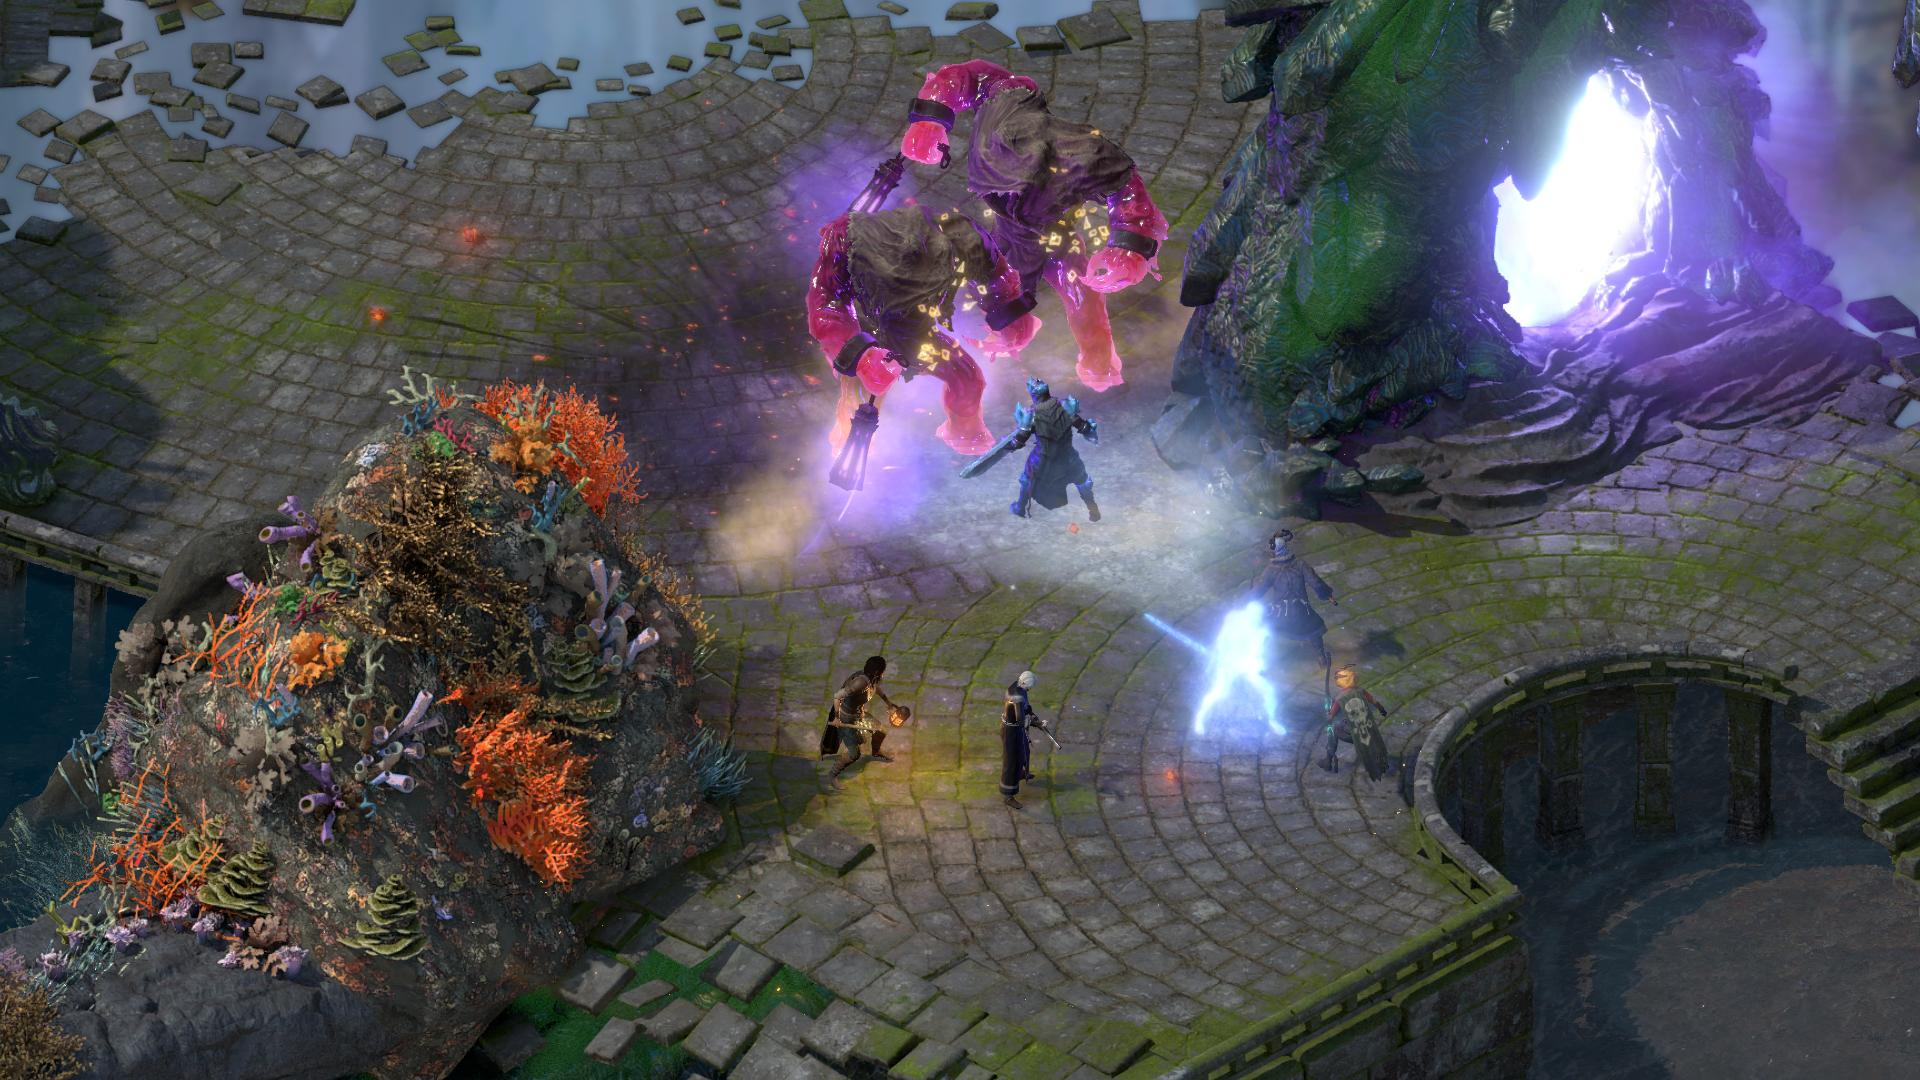 Pillars of Eternity II: Deadfire - Beast of Winter Review | RPG Site